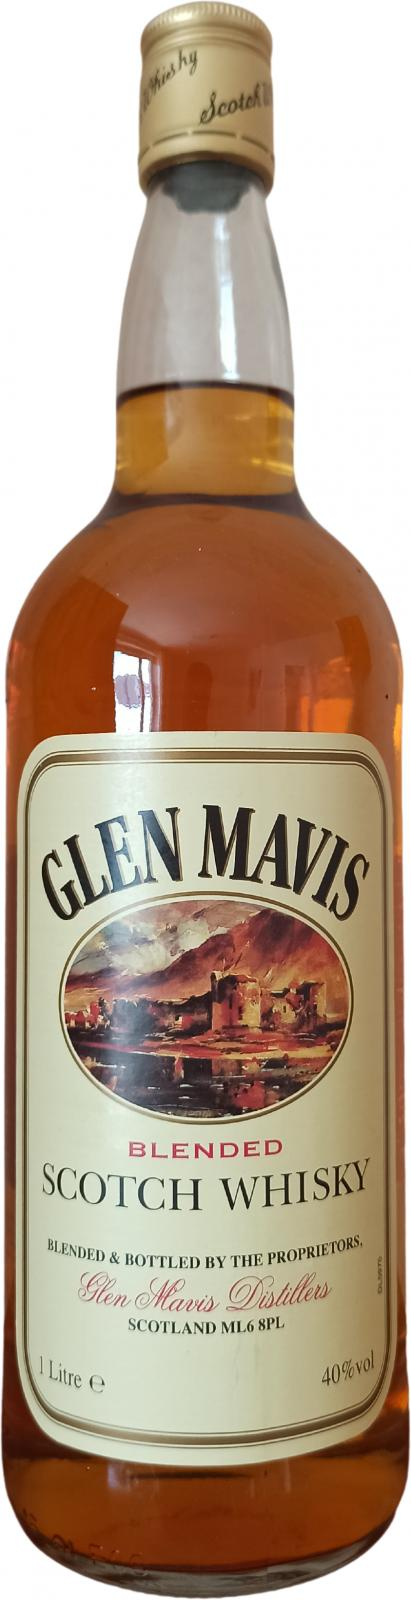 Glen Mavis NAS